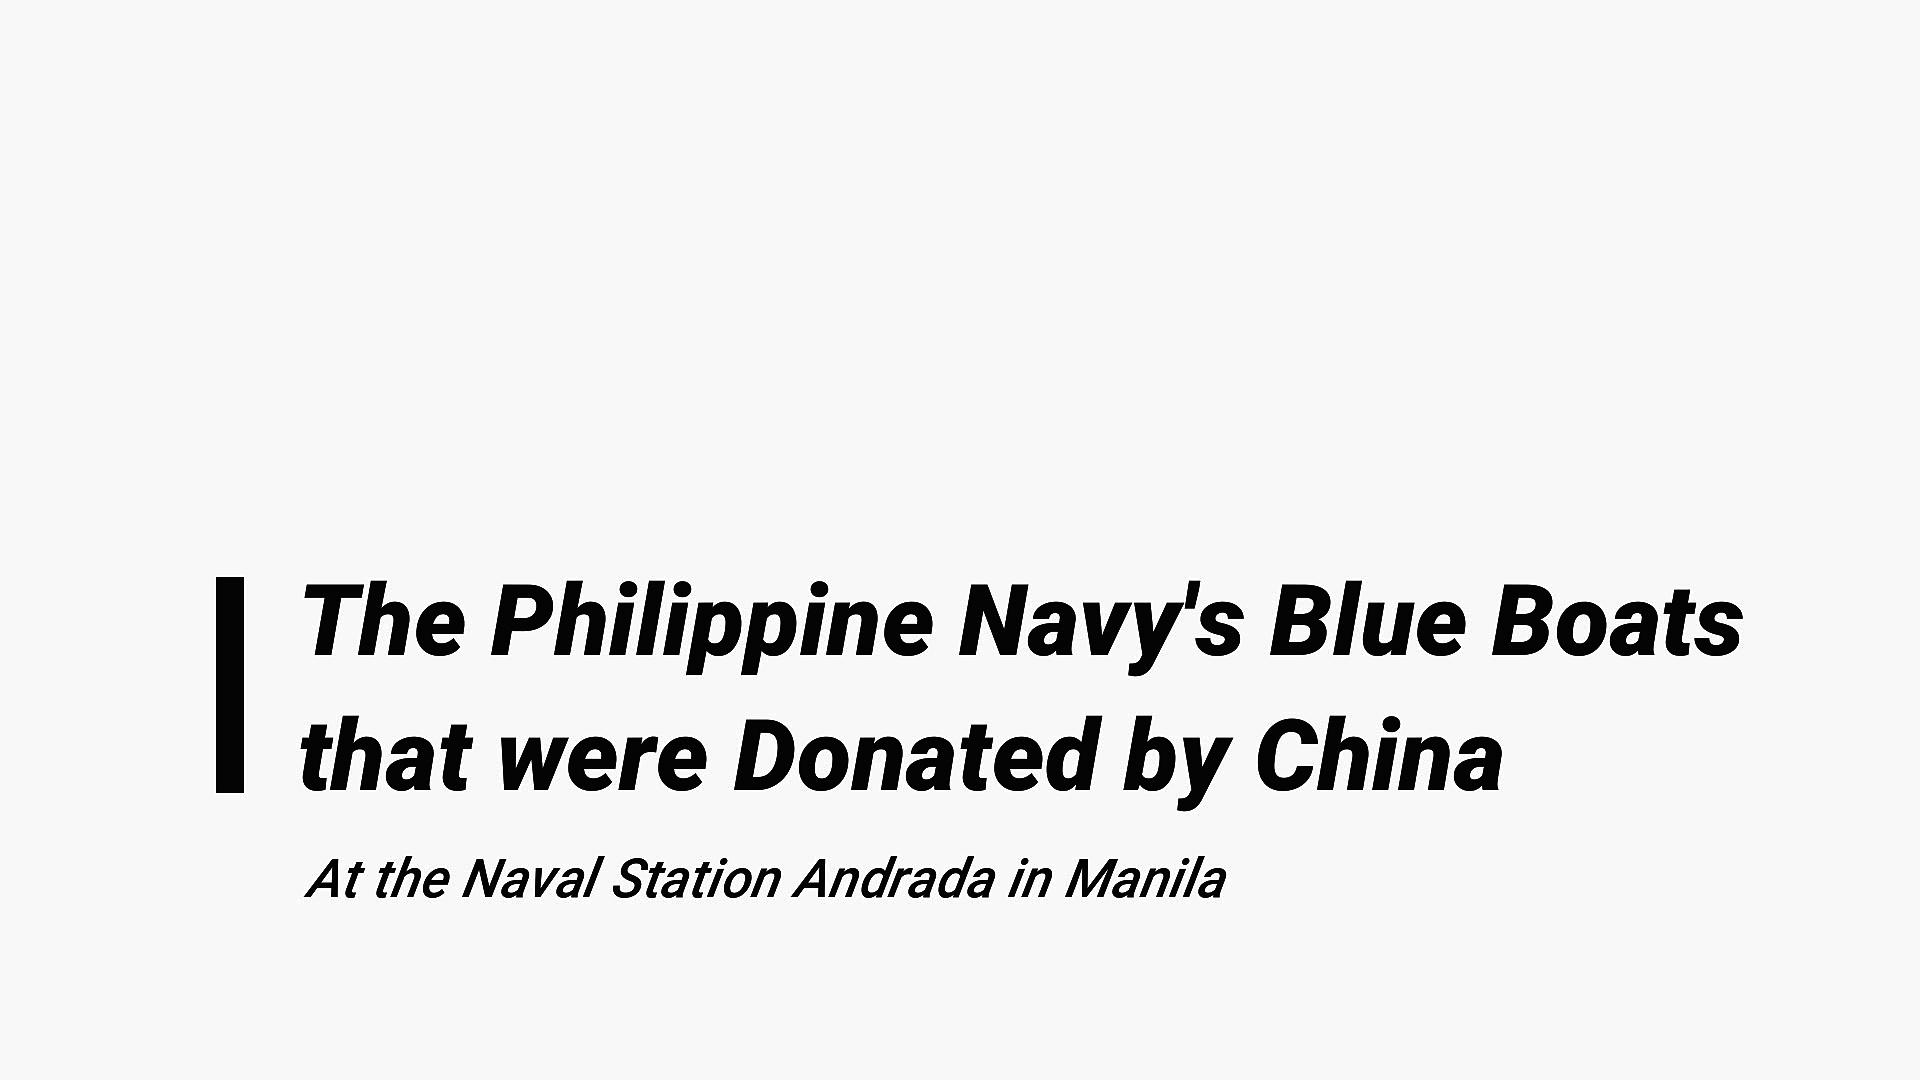 China Donated Blue Boats